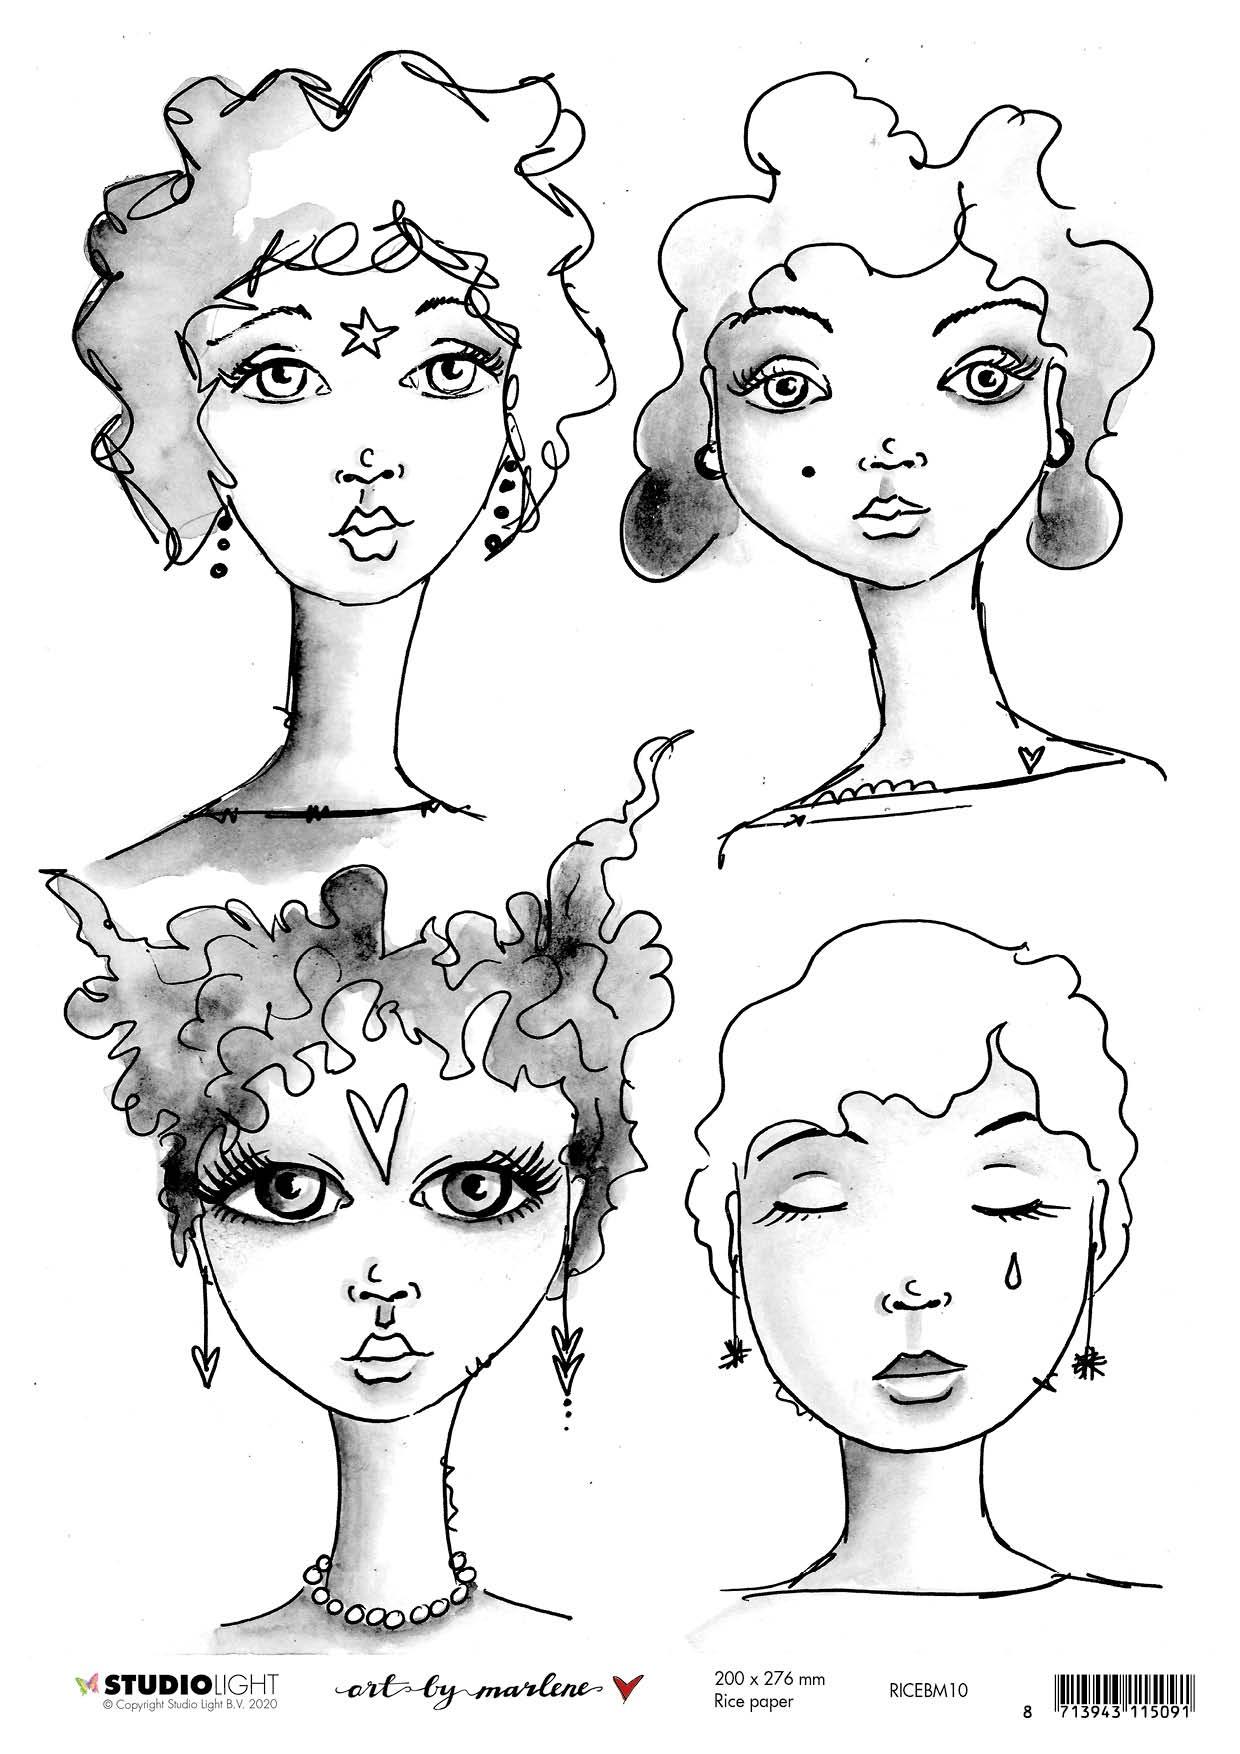 Art By Marlene - 5.0 Rice Paper Sheet A4 - NR. 10